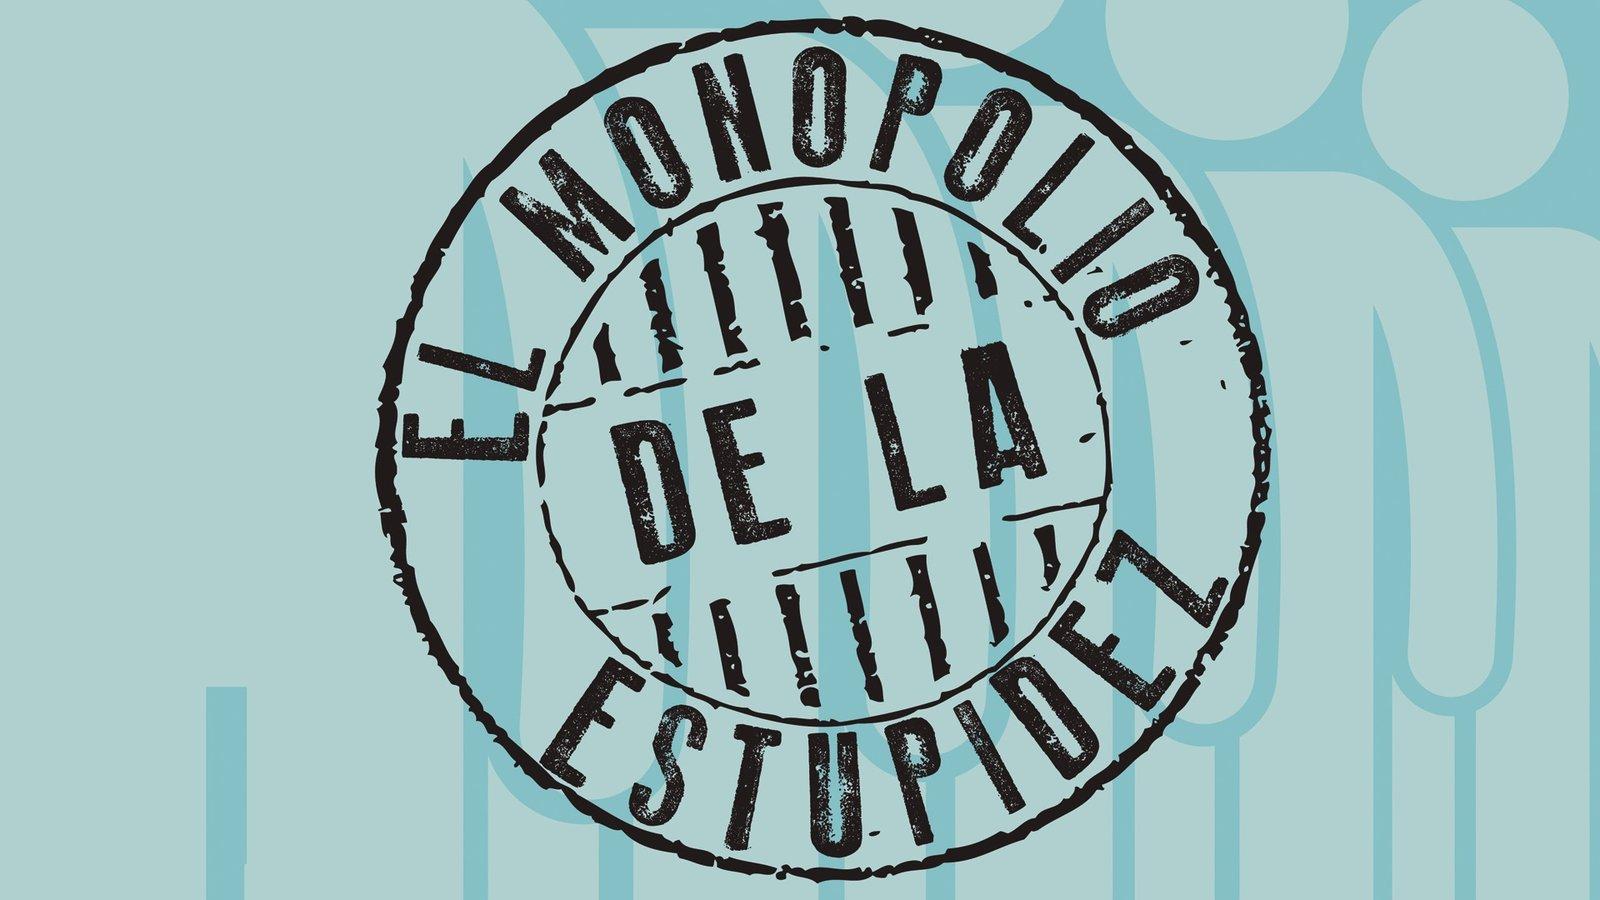 The Monopoly of Stupidity - El Monopolio De La Estupidez